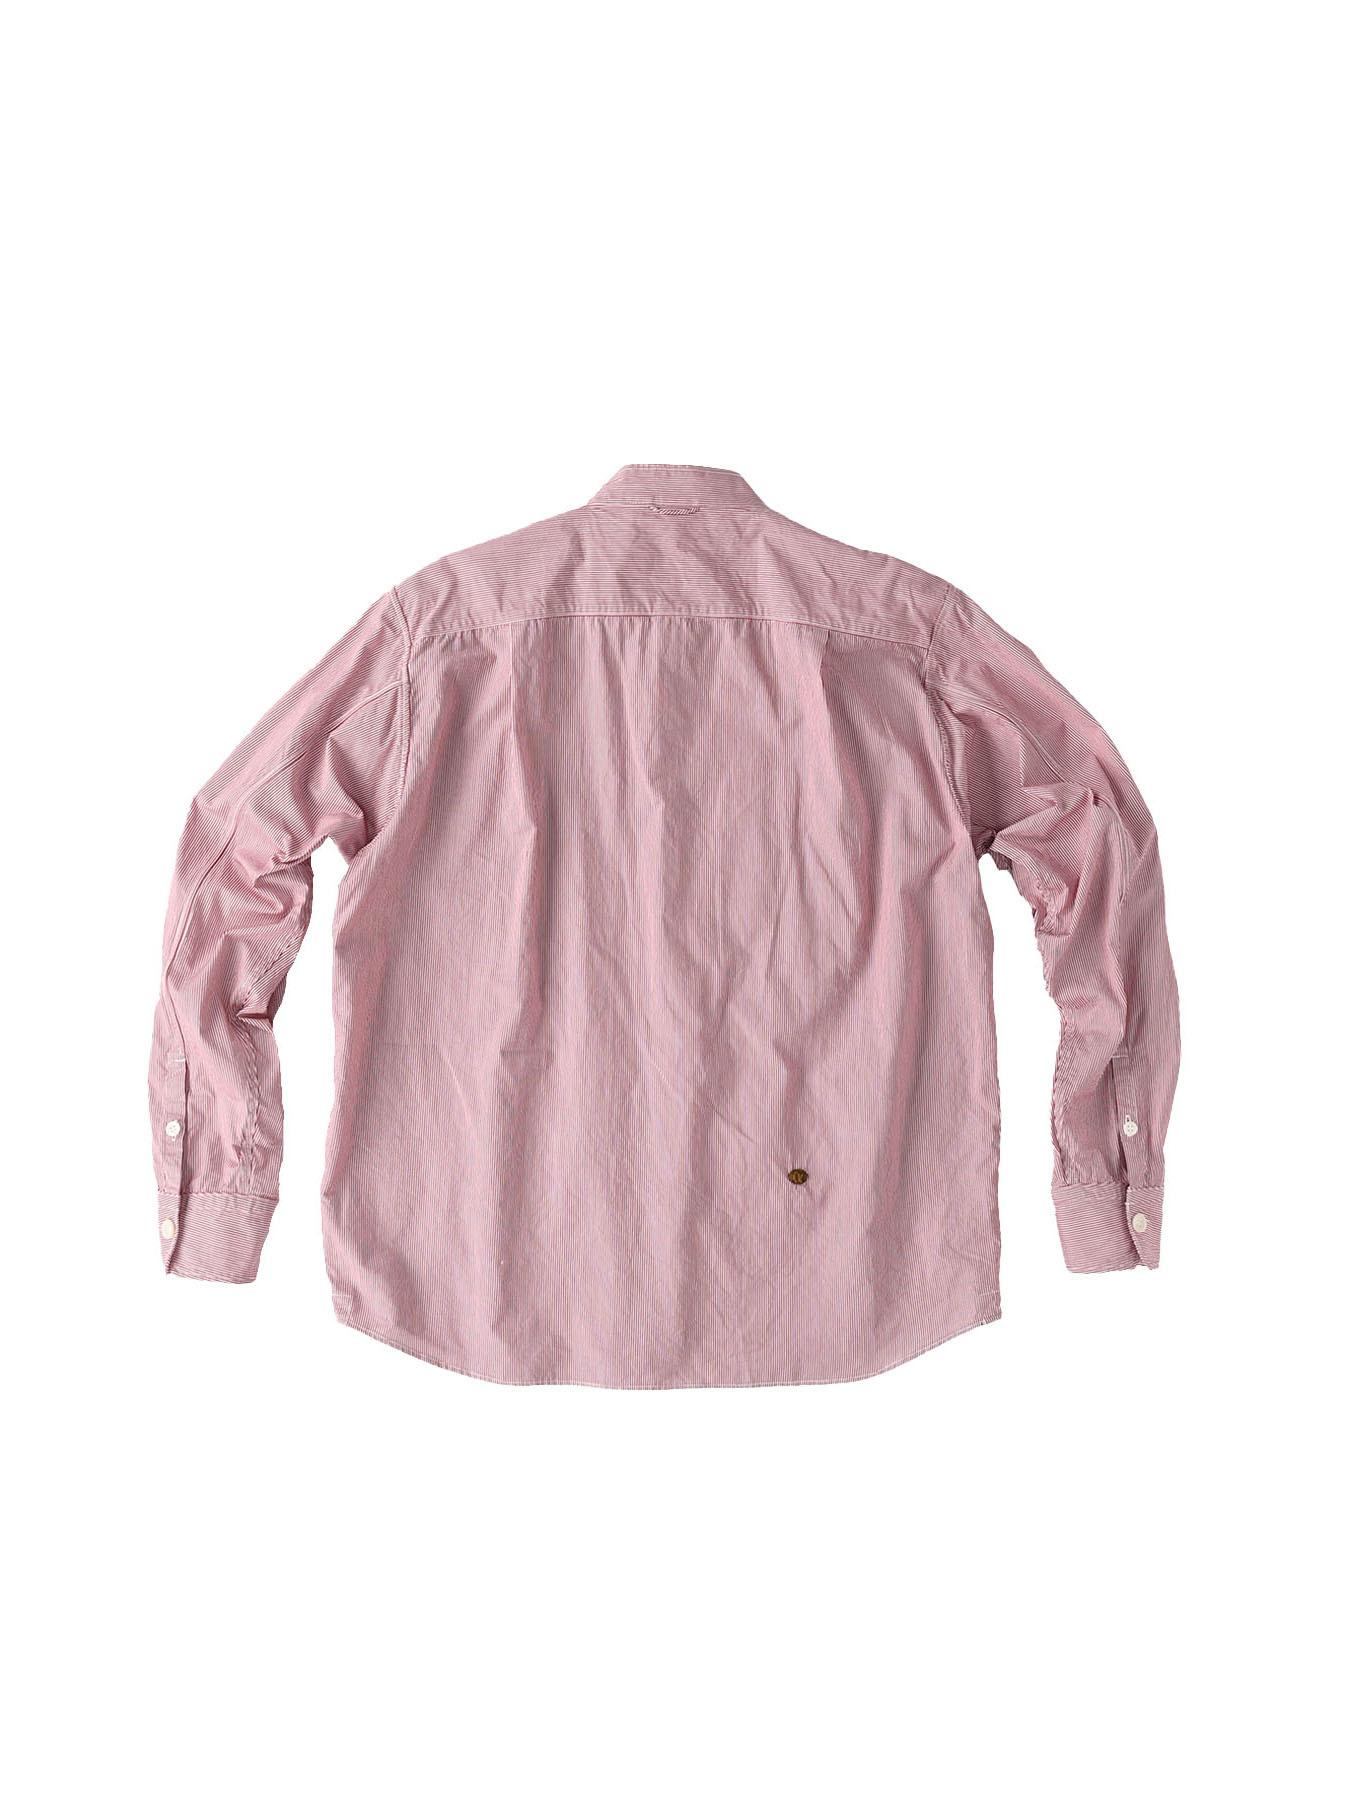 Miko Stand Collar 908 Ocean Shirt-8